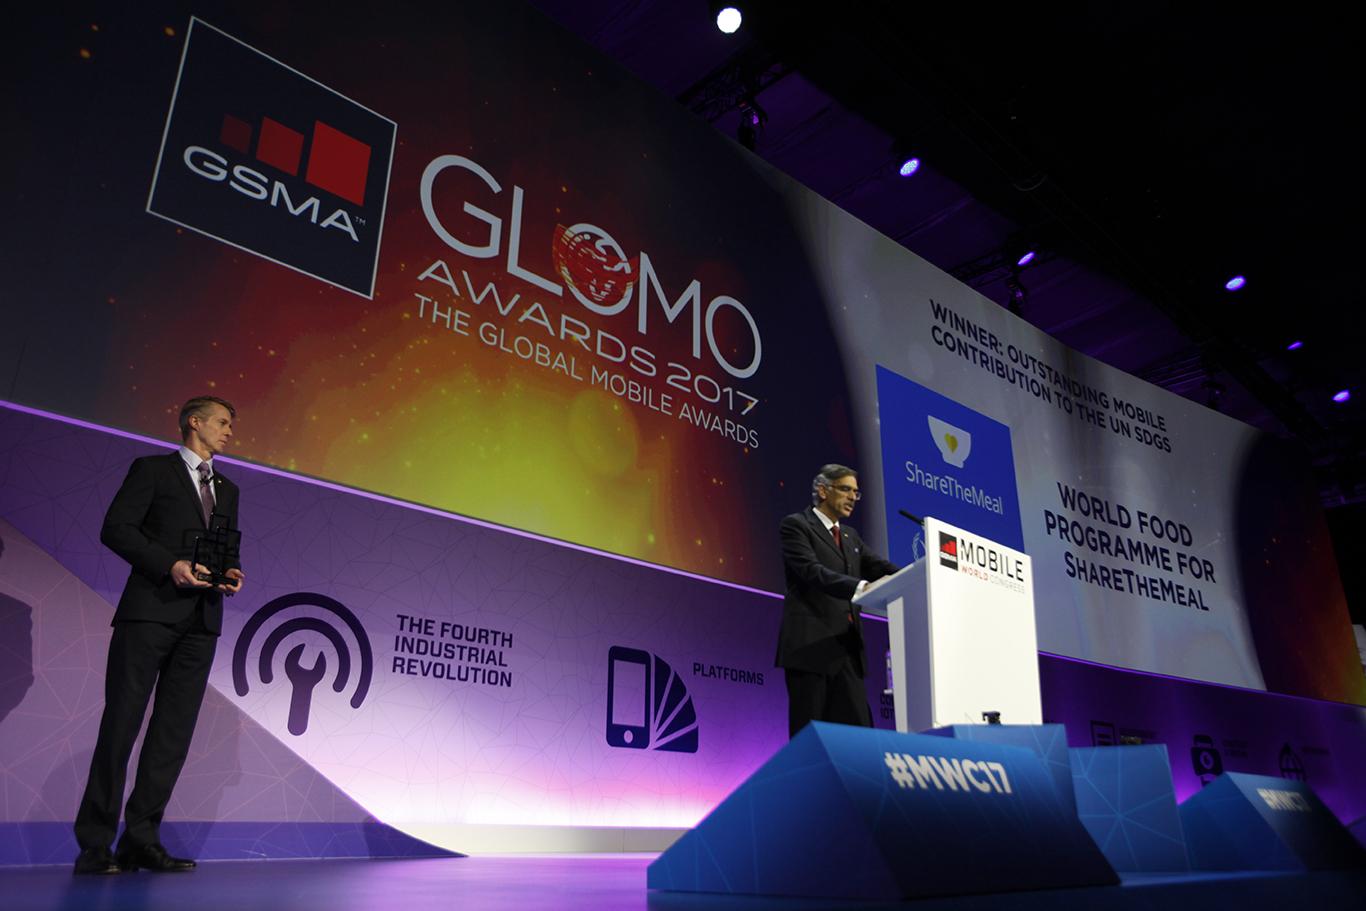 Mobile World Congress 2017 | EcoNet, Shell, Cisco, others win 2017 Glomo Awards